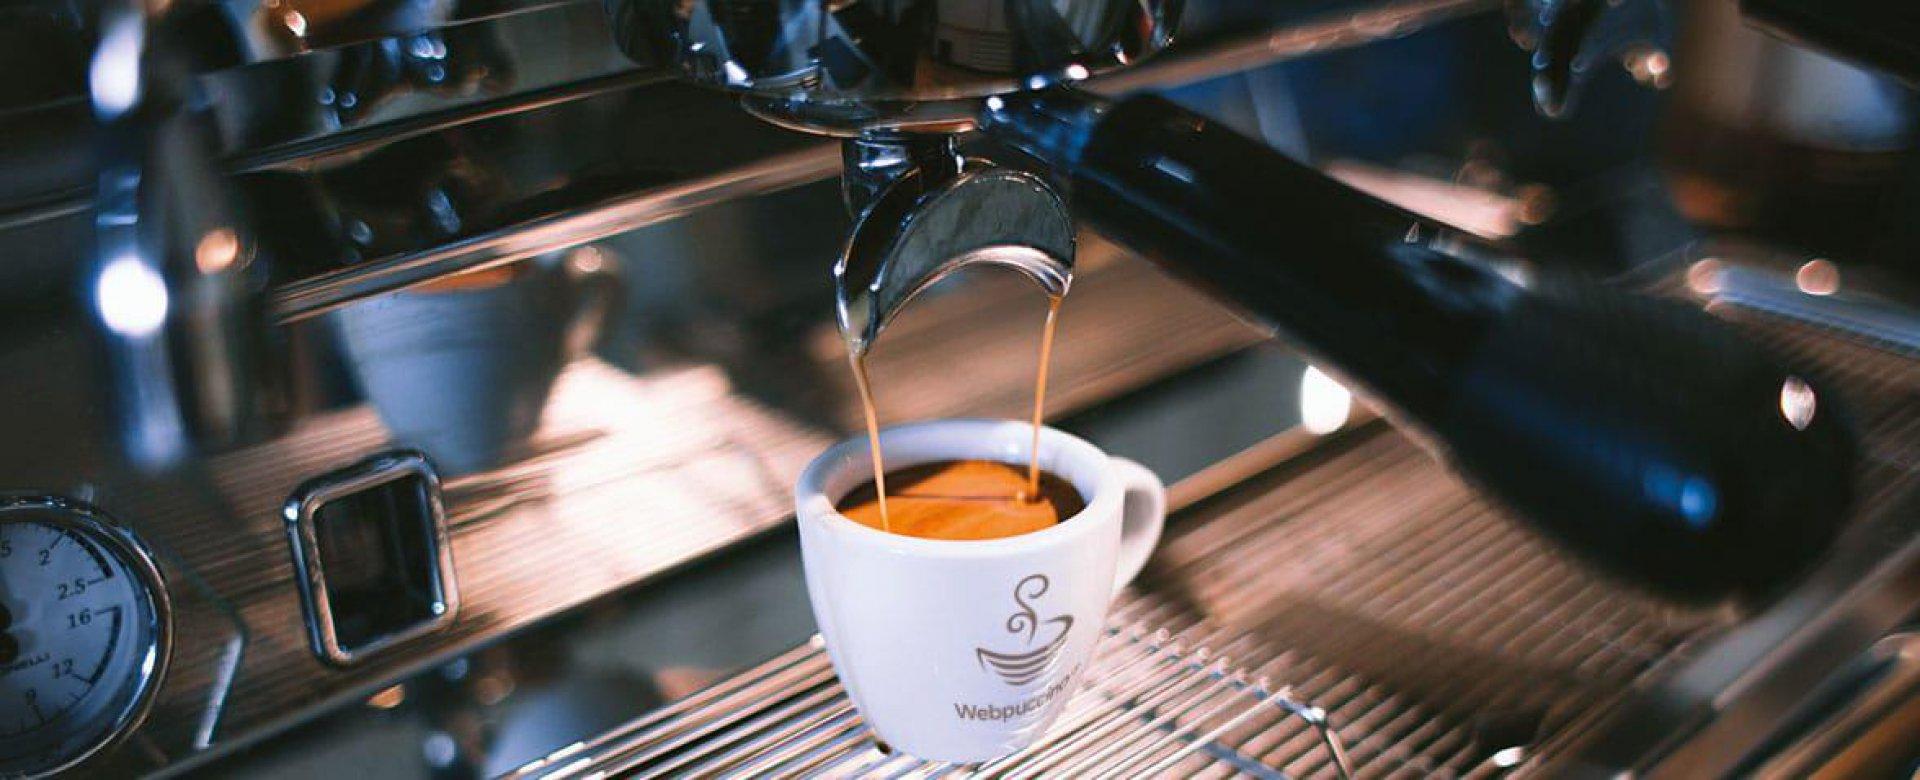 https://www.waterforlife.nl/files/visuals/_1920x960_fit_center-center_85_none/webpuccino-kwaliteit-service.jpg